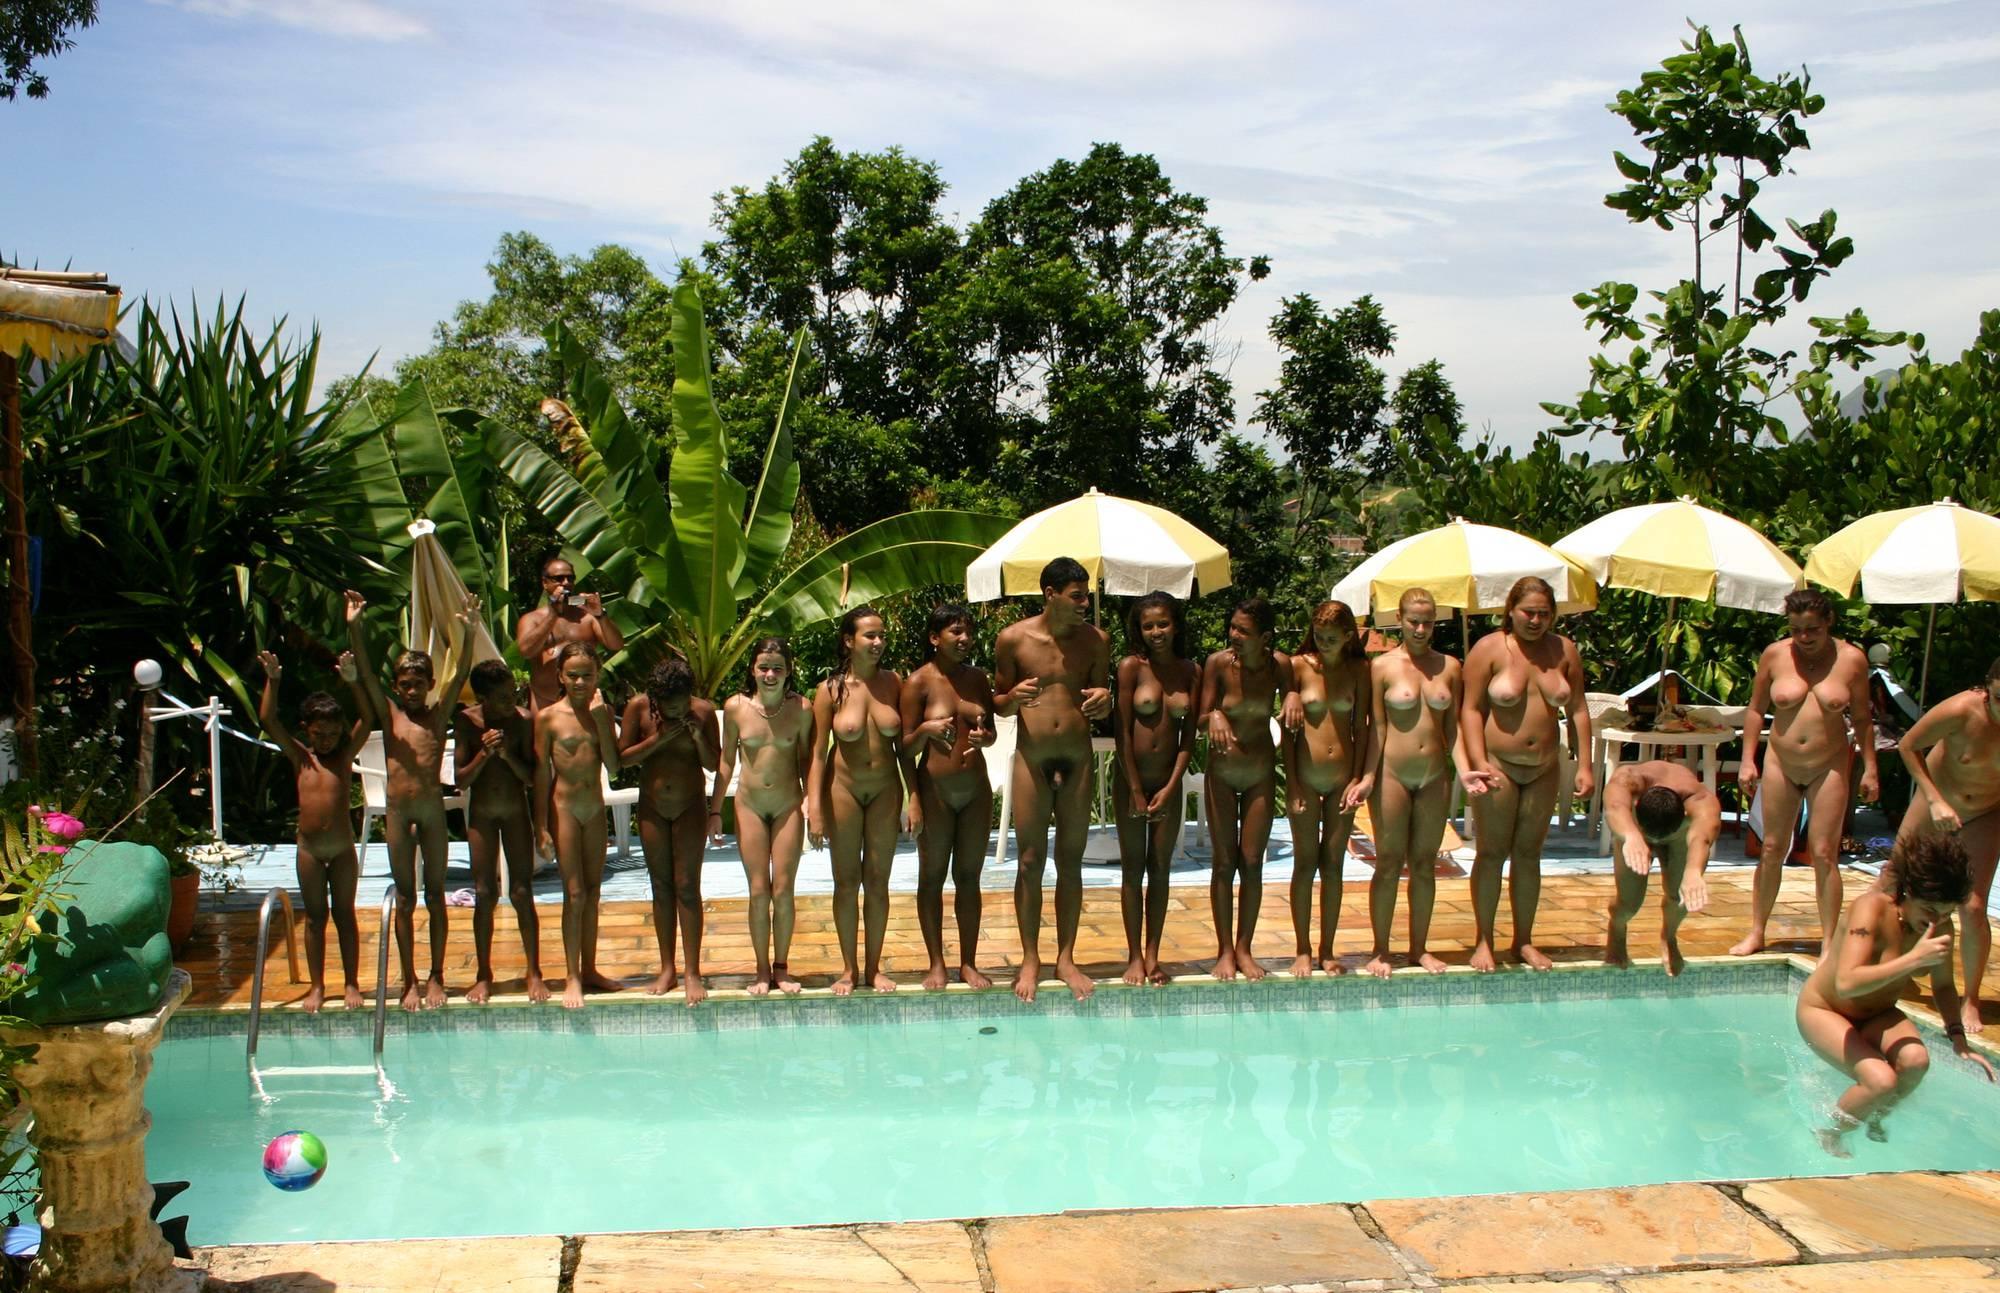 Brazilian Pool Line Group - 3